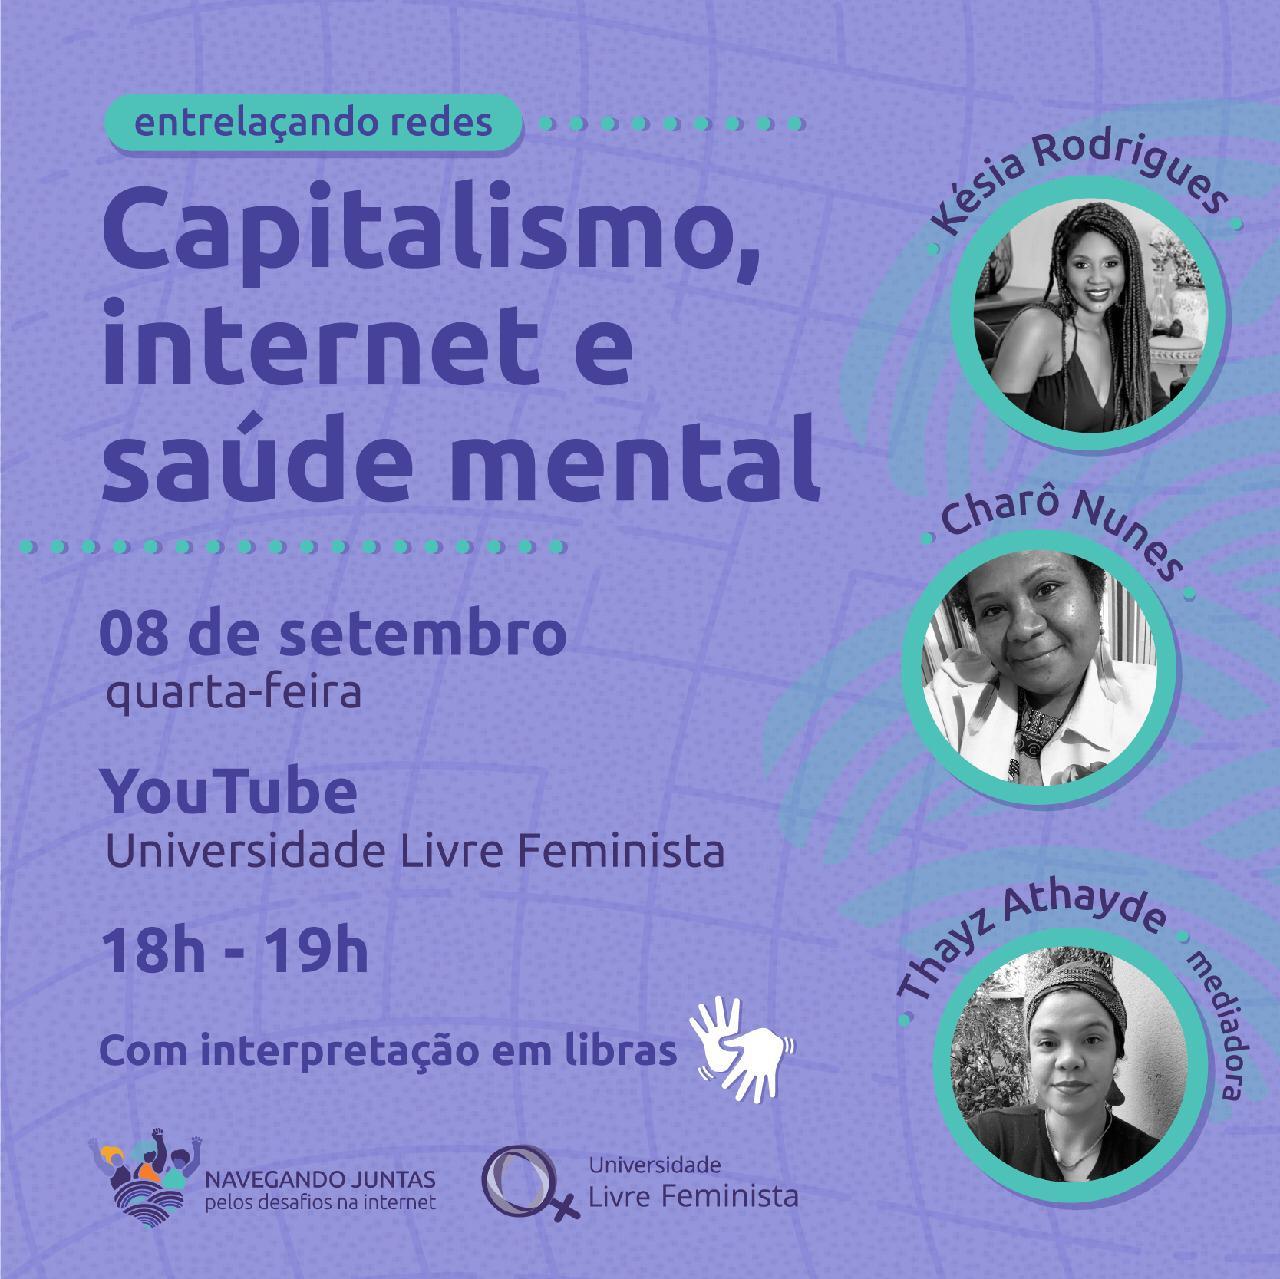 Entrelaçando redes: capitalismo, internet e saúde mental